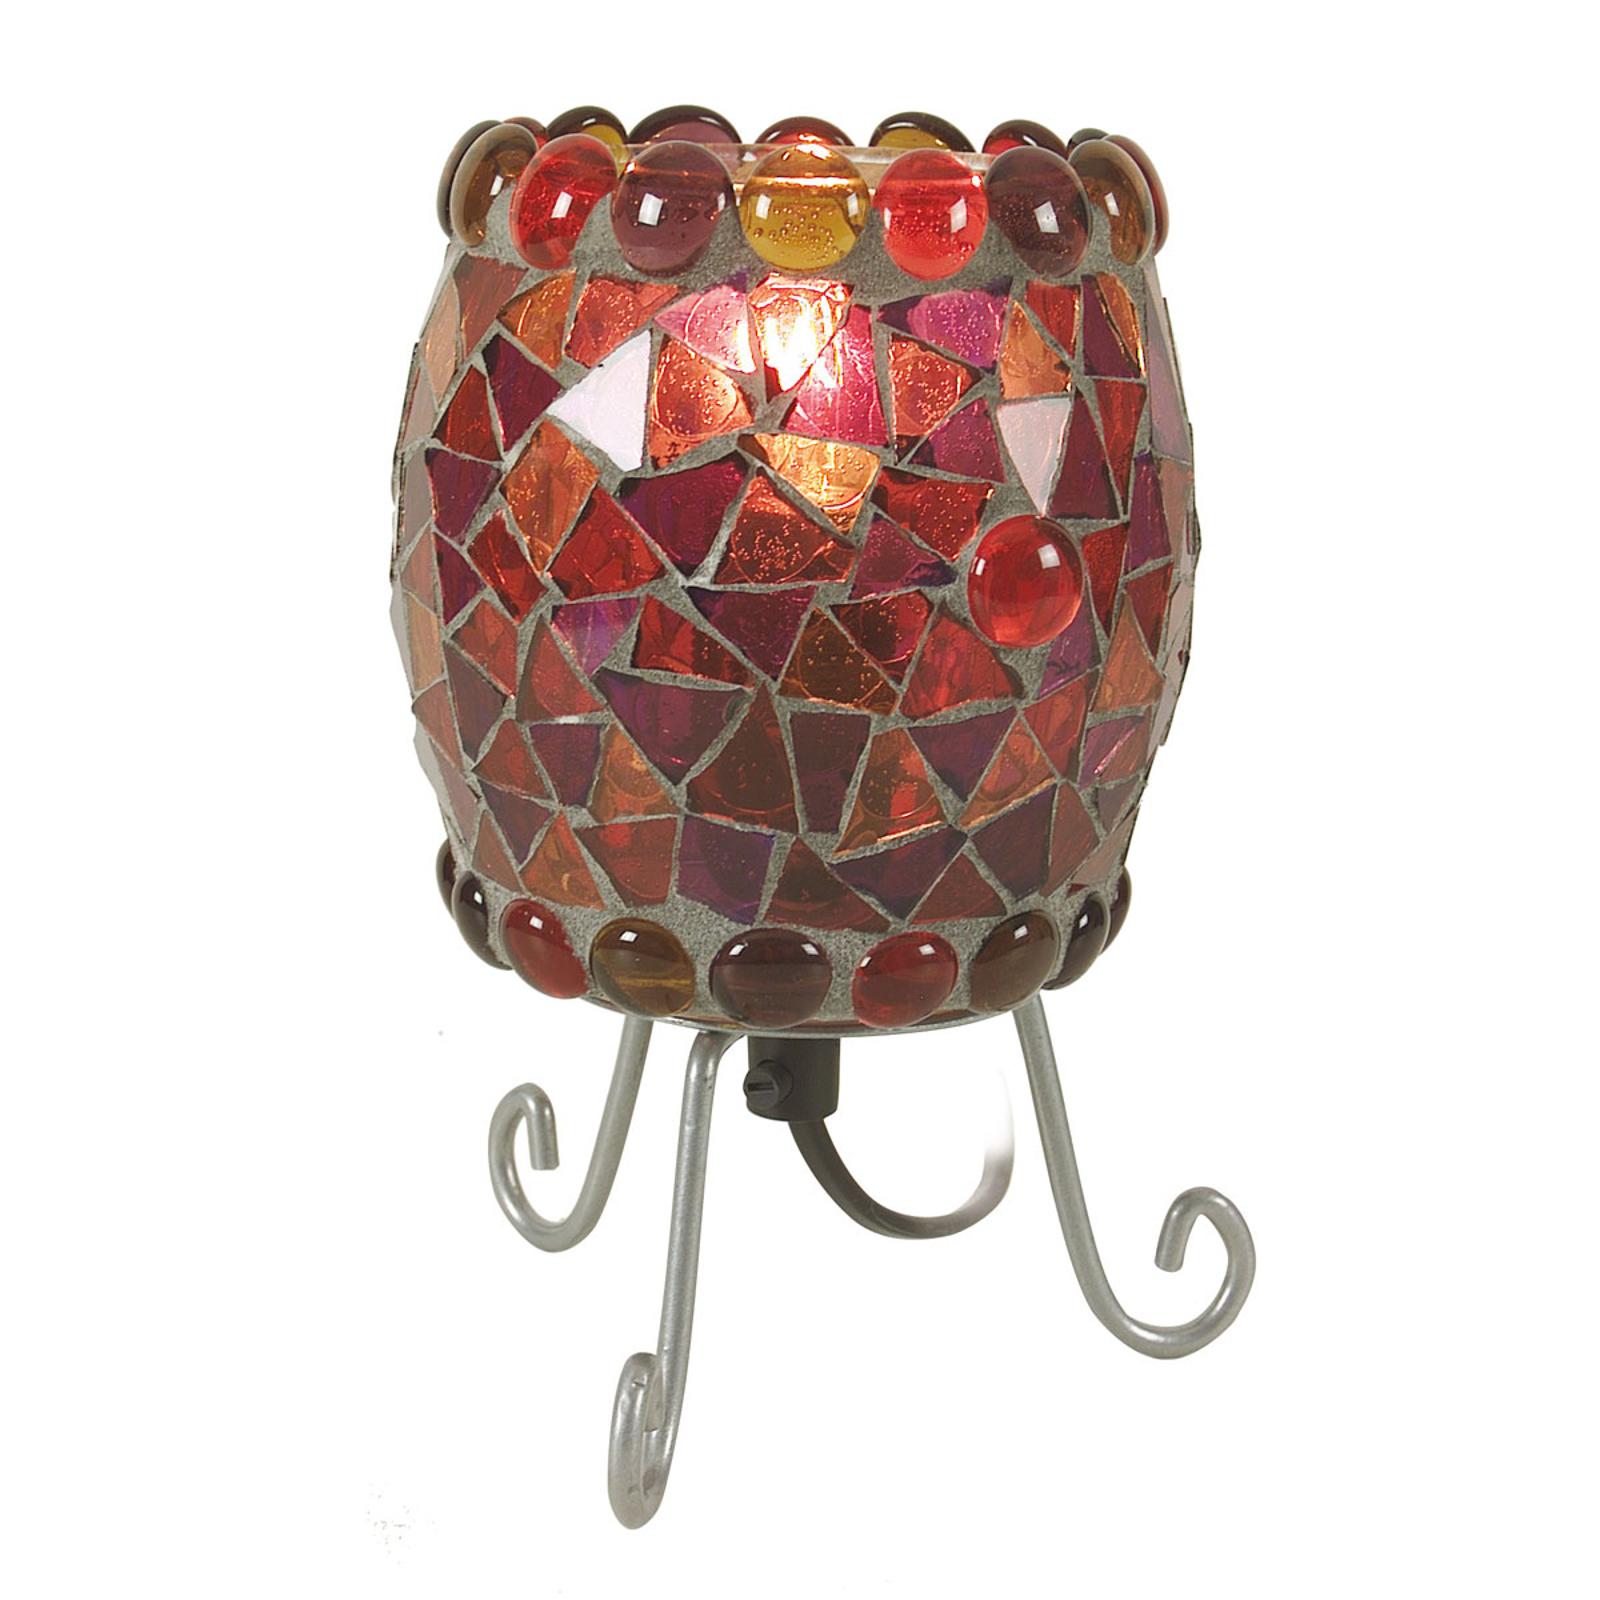 Tafellamp Enya m. glasmozaïek rood